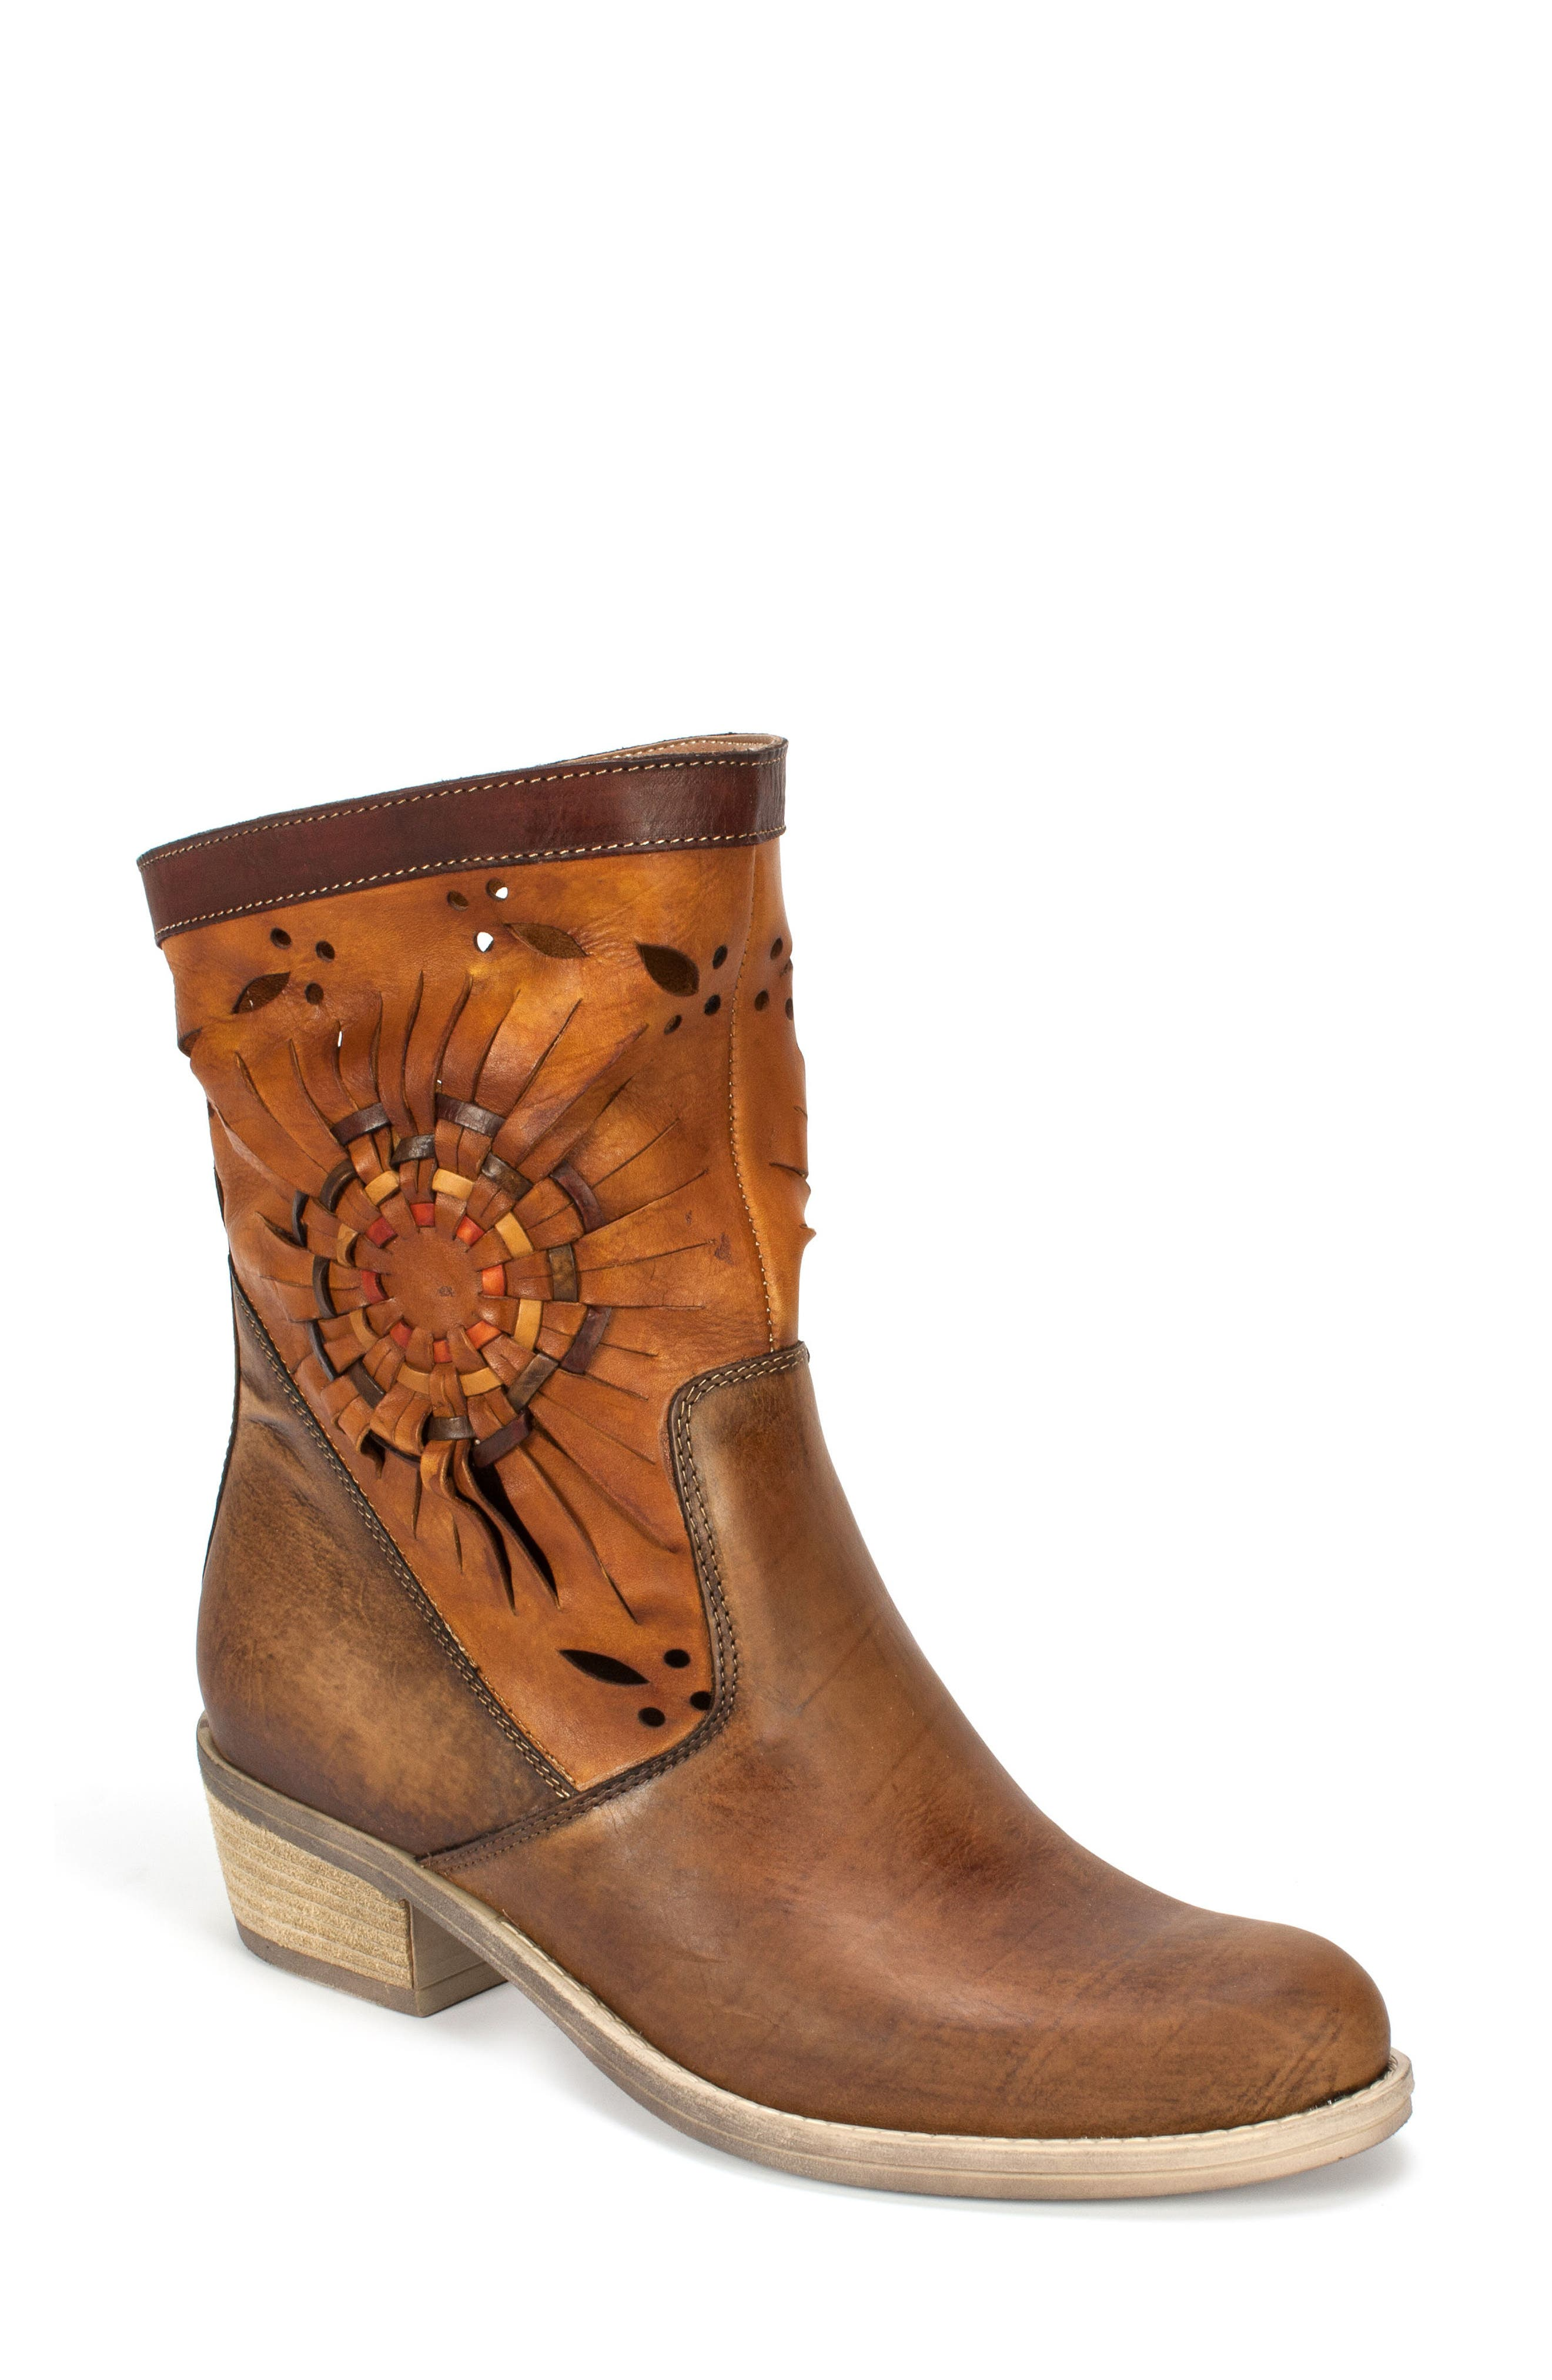 Taryn Woven Sunburst Boot,                         Main,                         color, 200